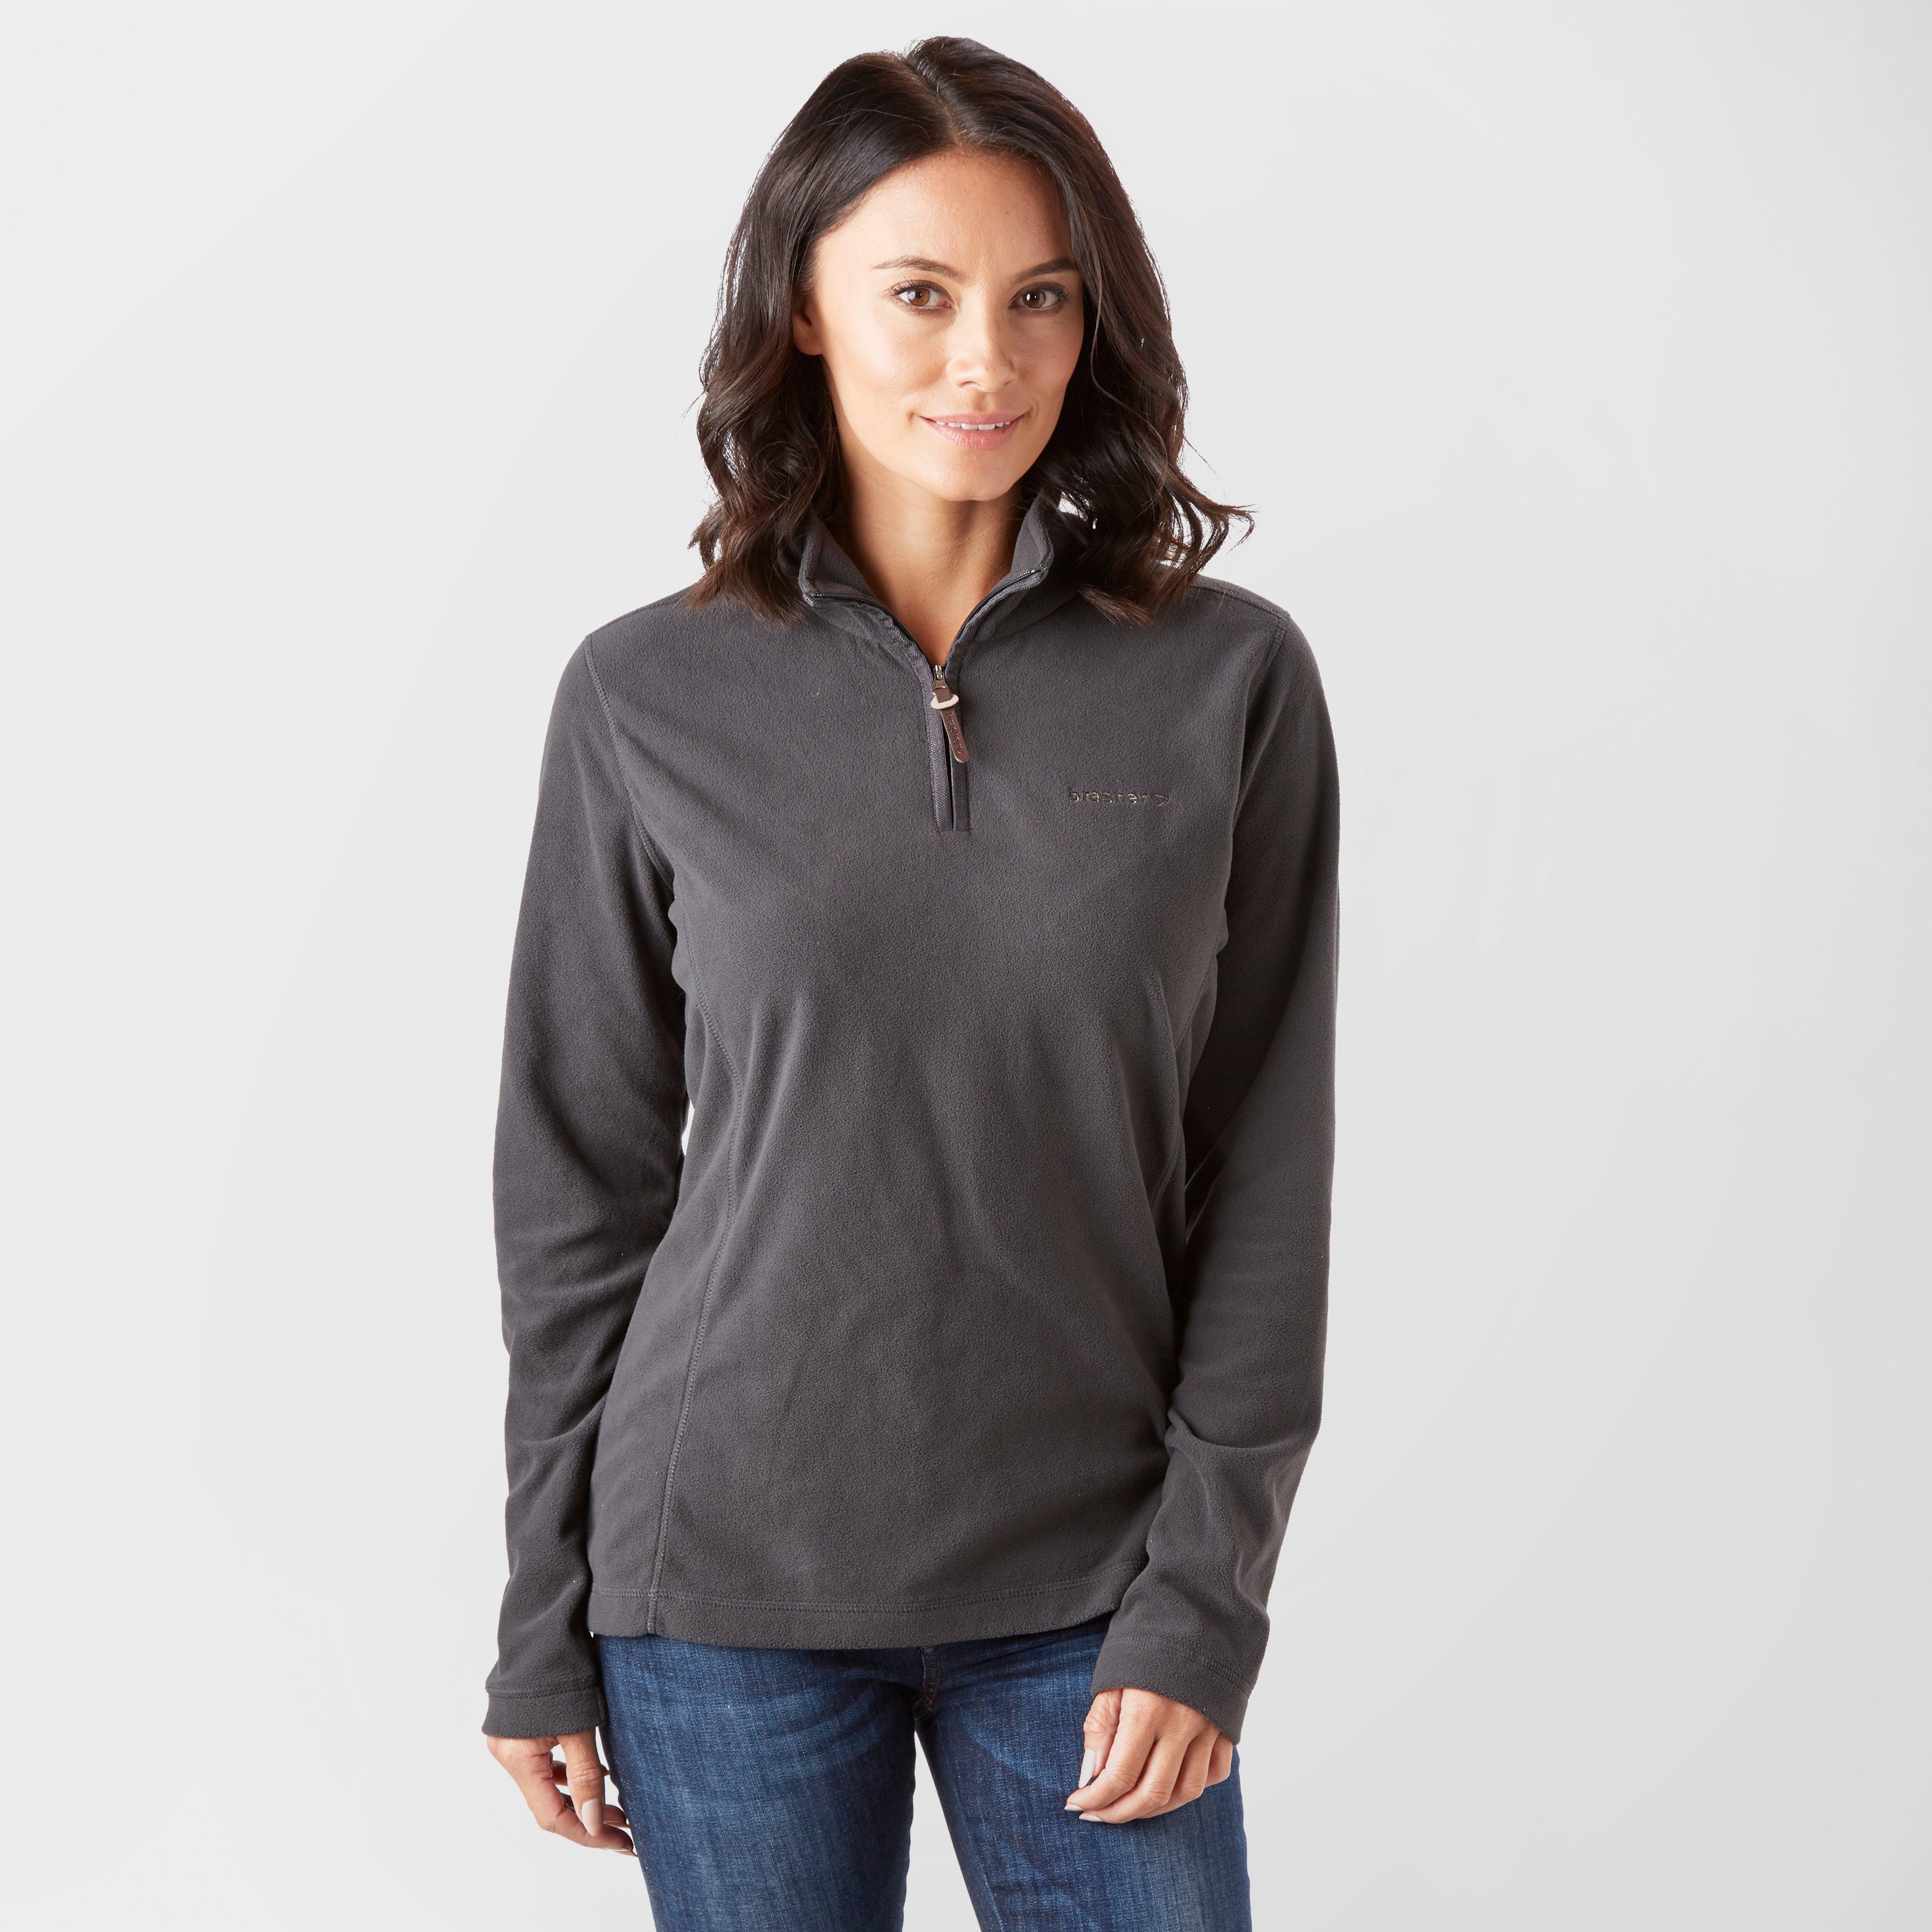 Brasher Womens Bleaberry Half Zip Fleece - Grey/dgy  Grey/dgy